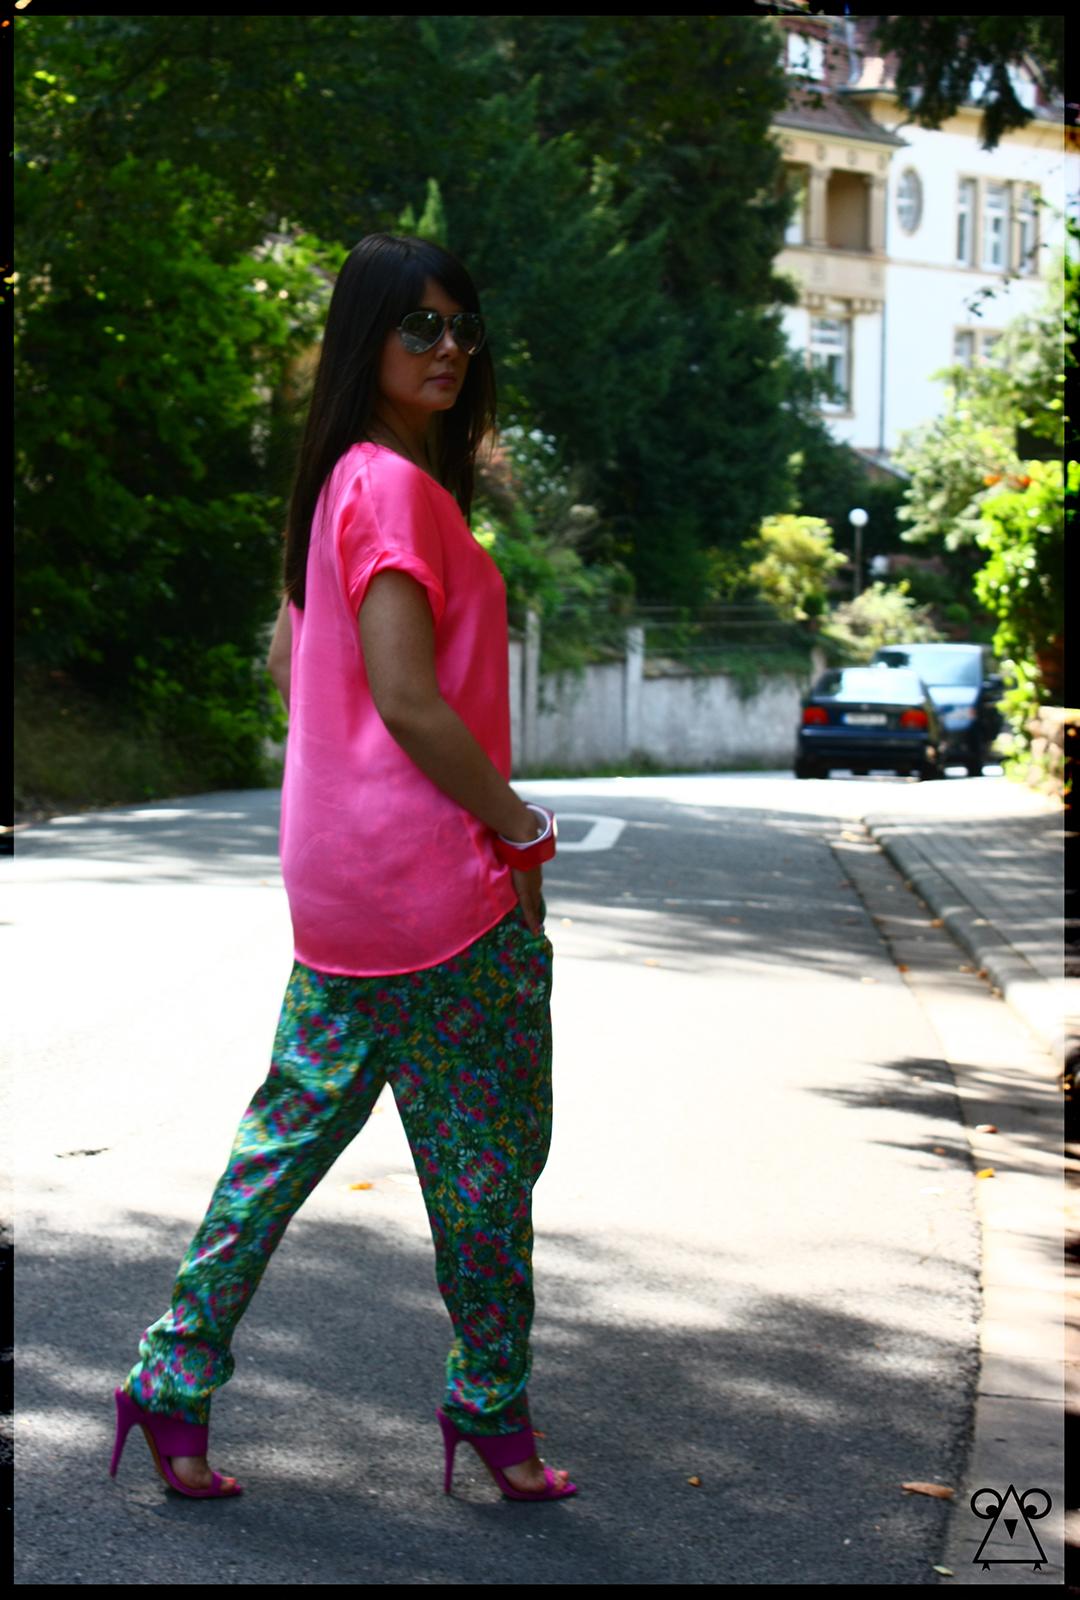 fashionambit-fashionblog-muenchen-styleblog-munich-blogger-deutschland-fashionblogger-bloggerdeutschland-style-blog-lifestyle-blog-modeblog-mango-